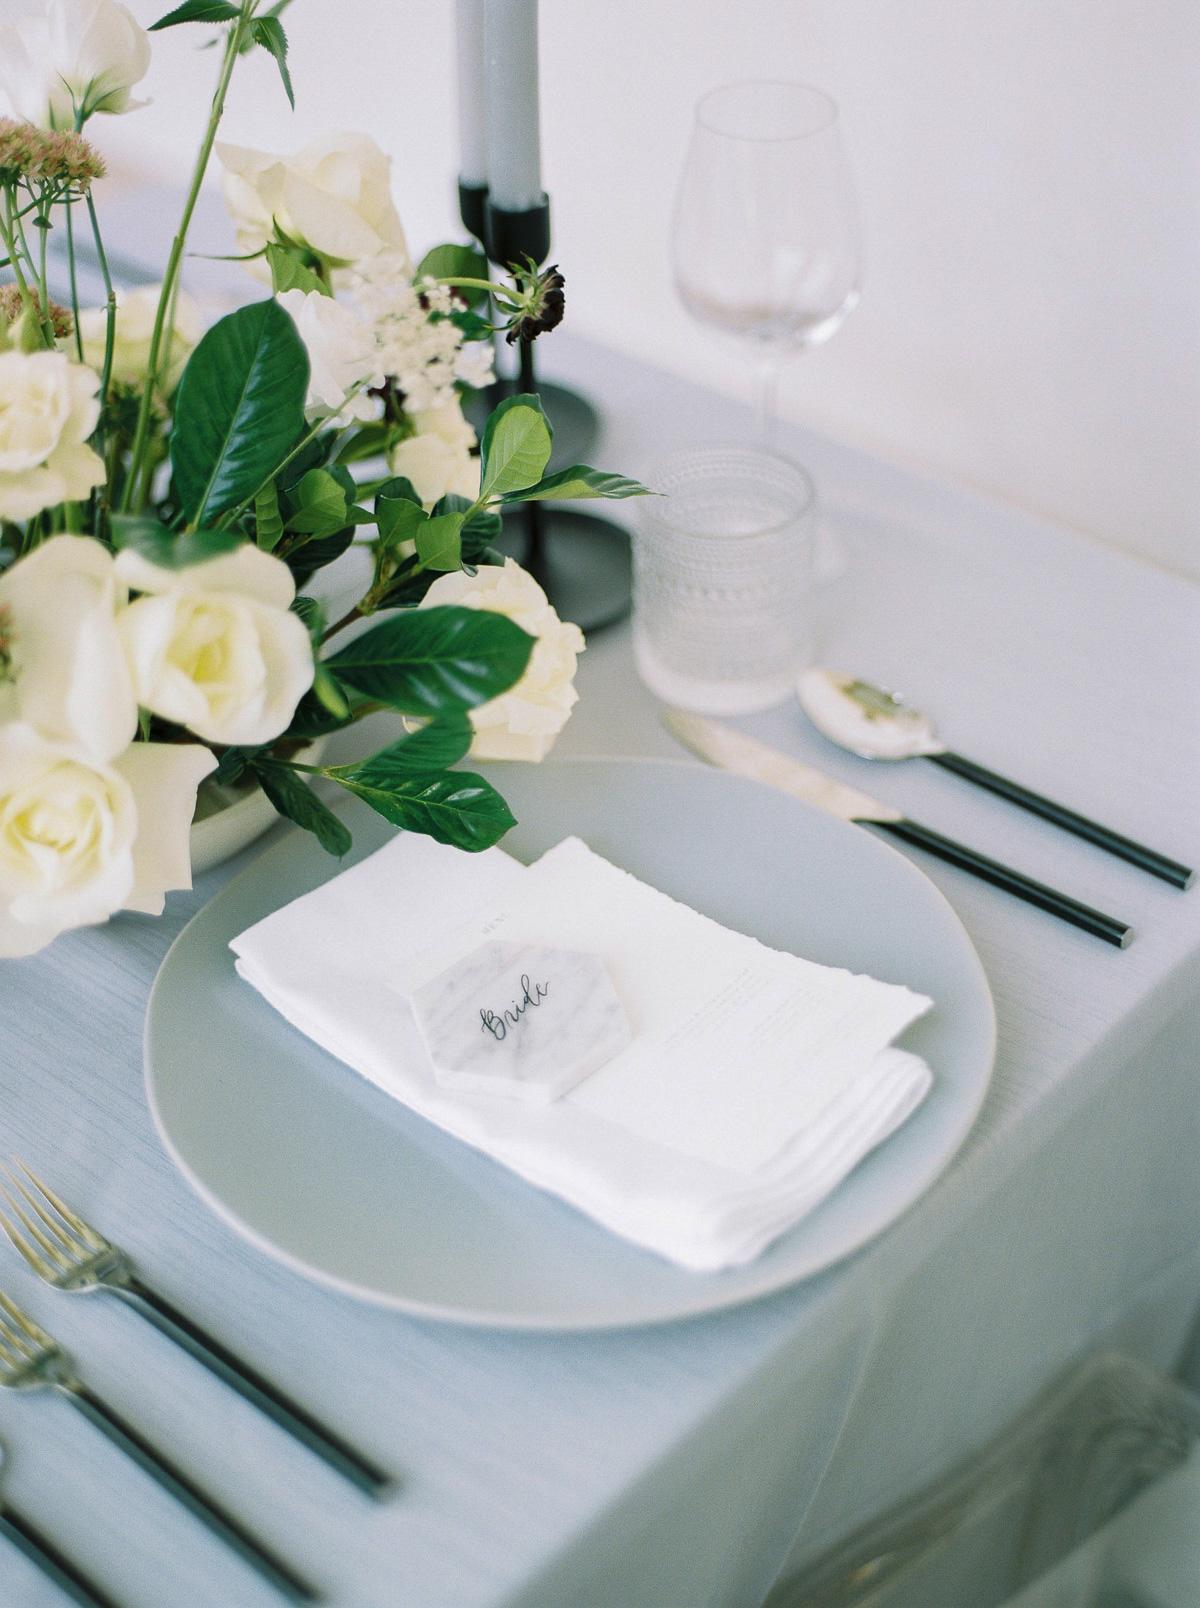 kurtz-orpia-photography-vineyard-bride-swish-list-dundurn-castle-dundas-wedding-editorial-32.jpg